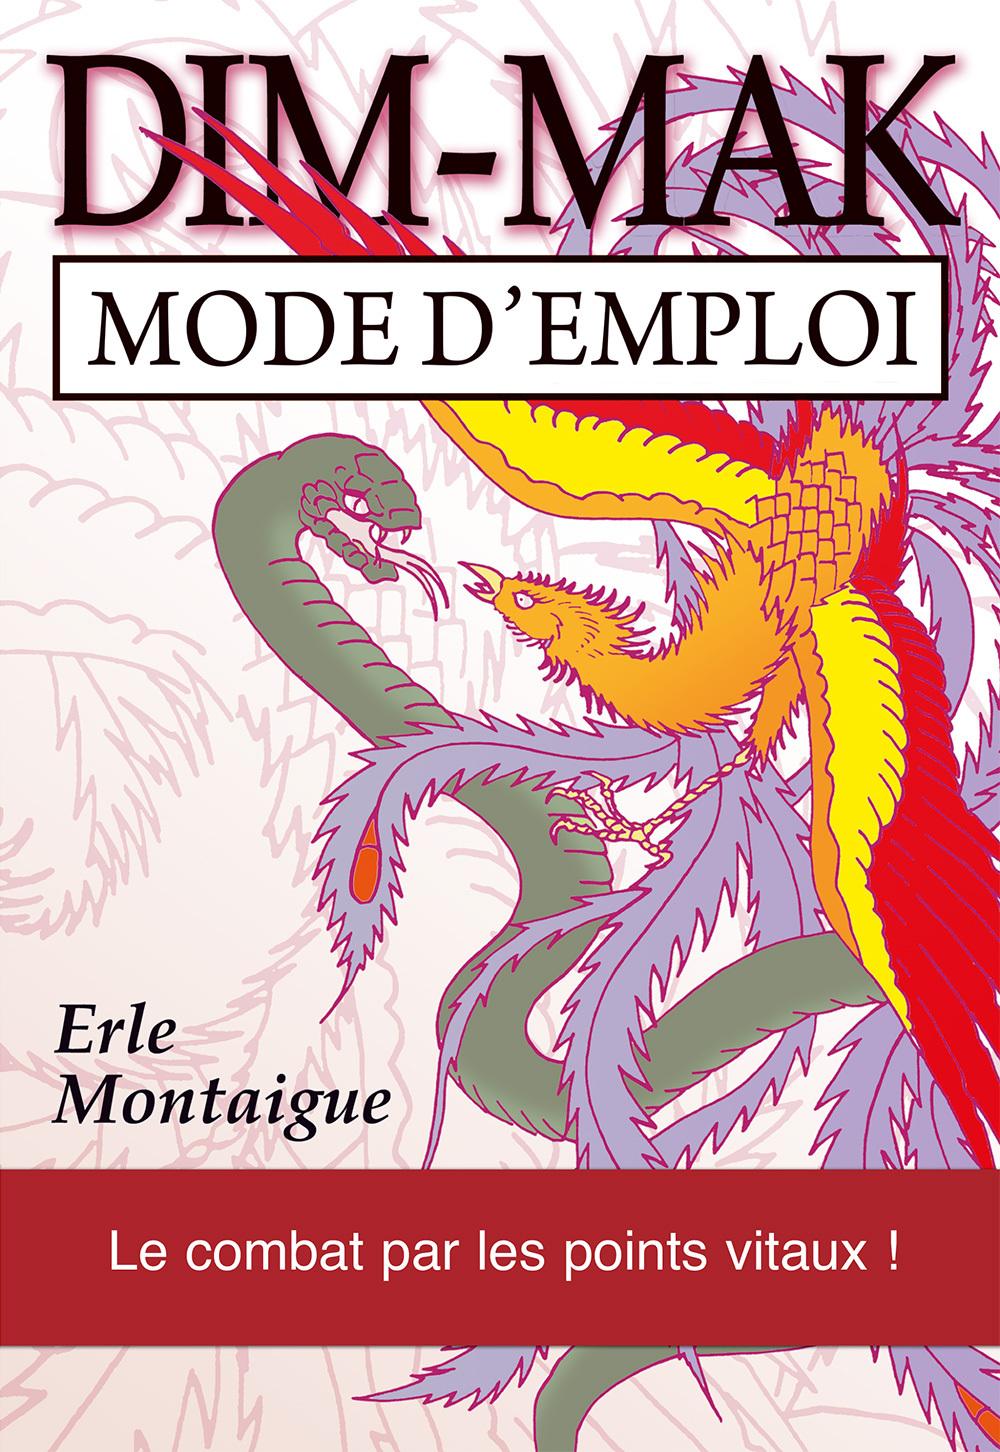 DIM-MAK : MODE D'EMPLOI